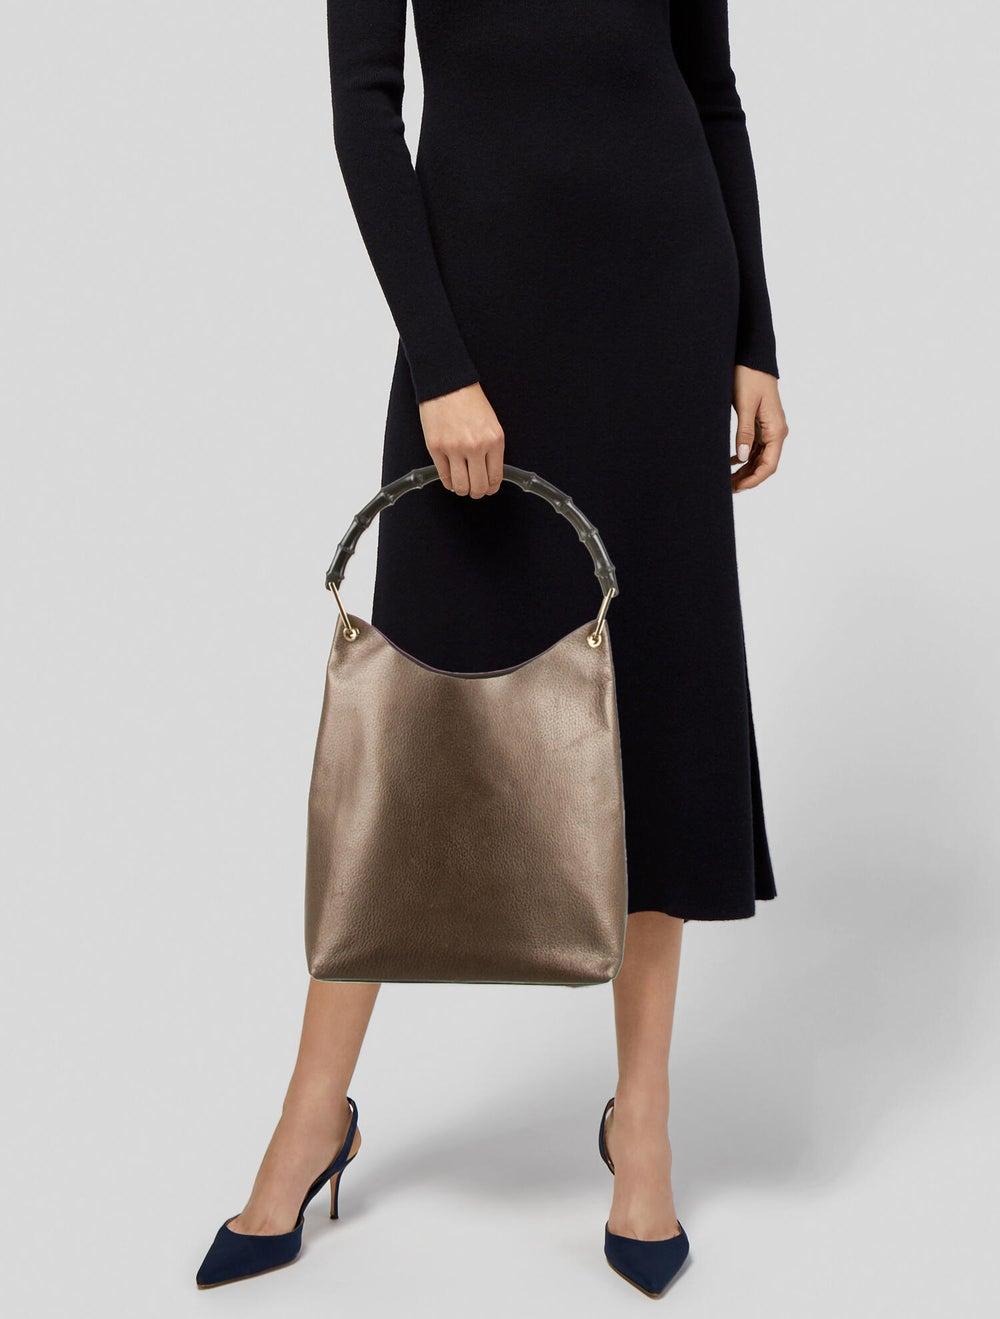 Gucci Bamboo Handle Leather Hobo Brown - image 2